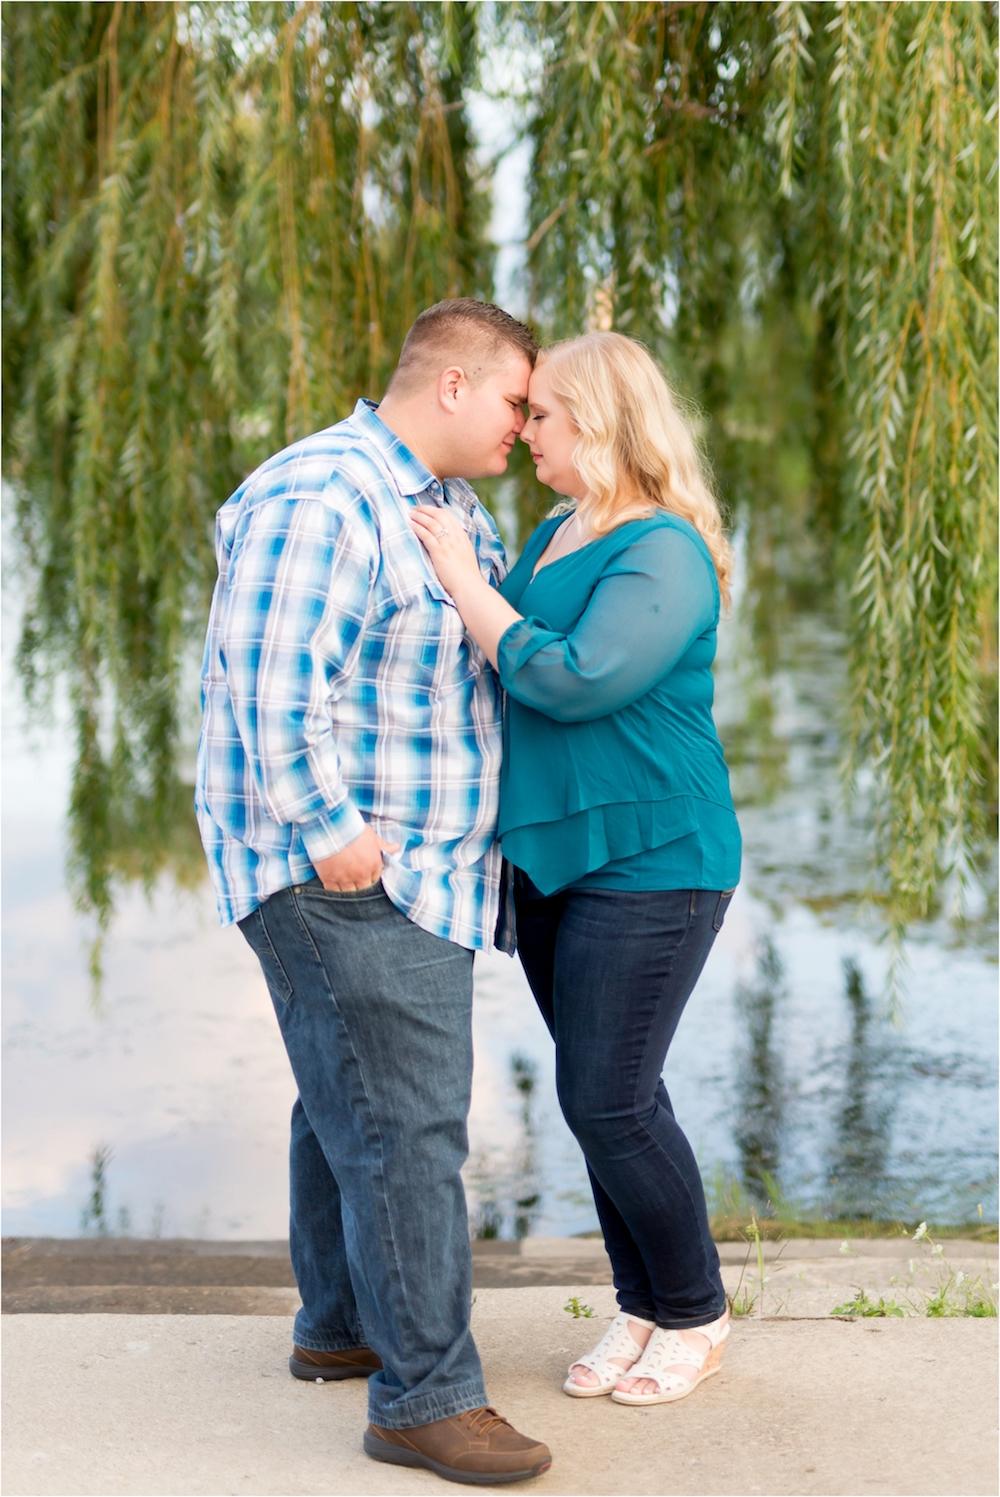 belle-isle-detroit-michigan-engagement-photo-49.jpg